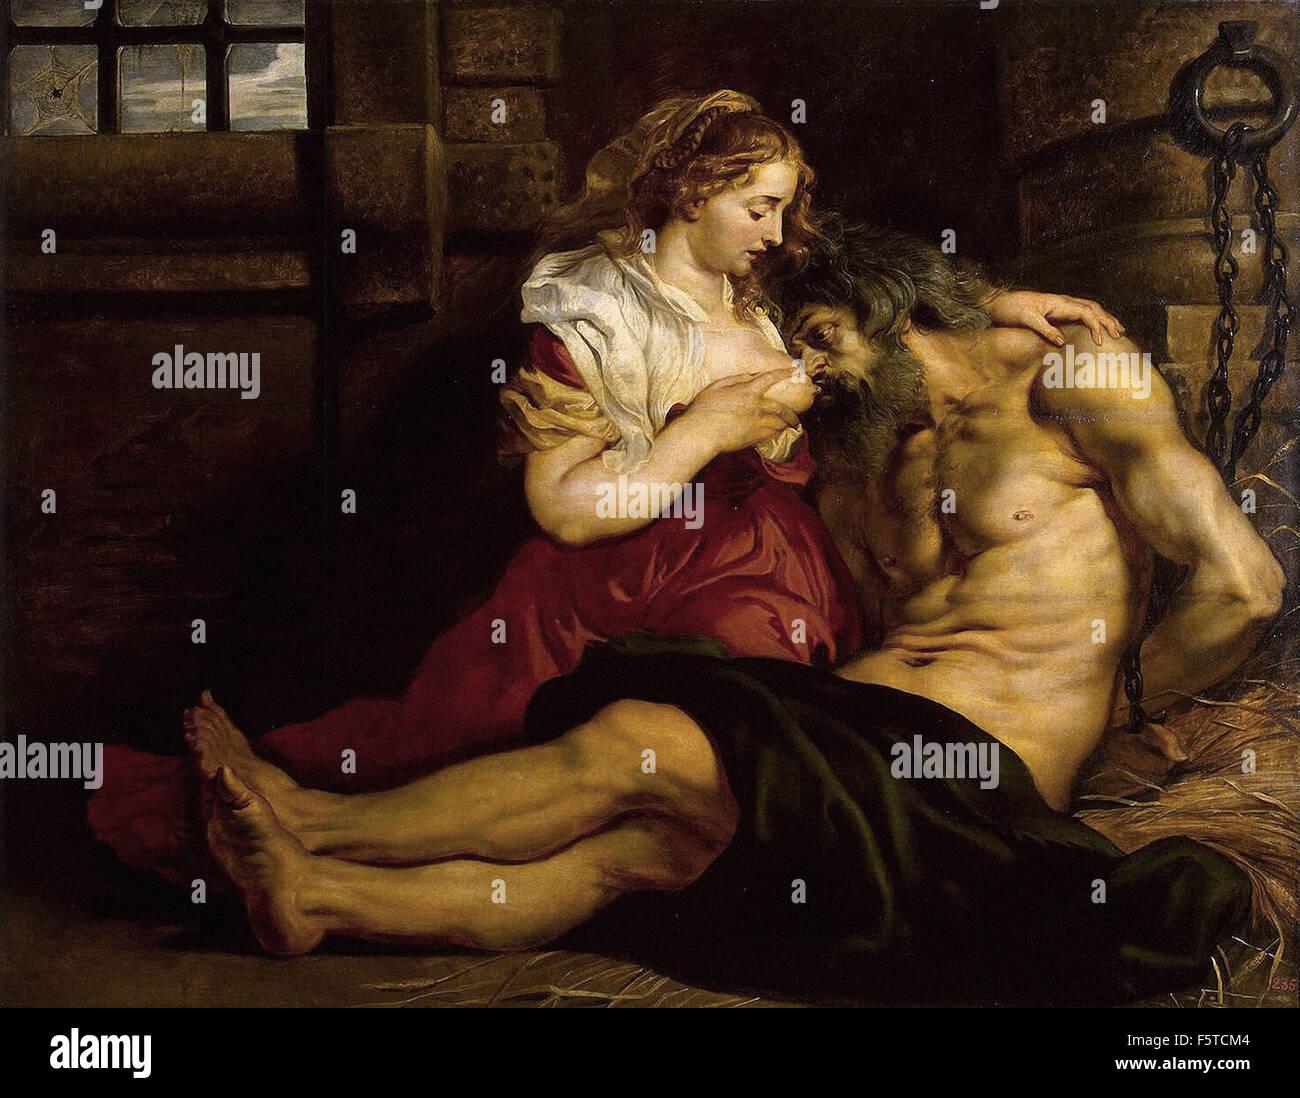 Peter Paul Rubens - Roman Charity - Stock Image